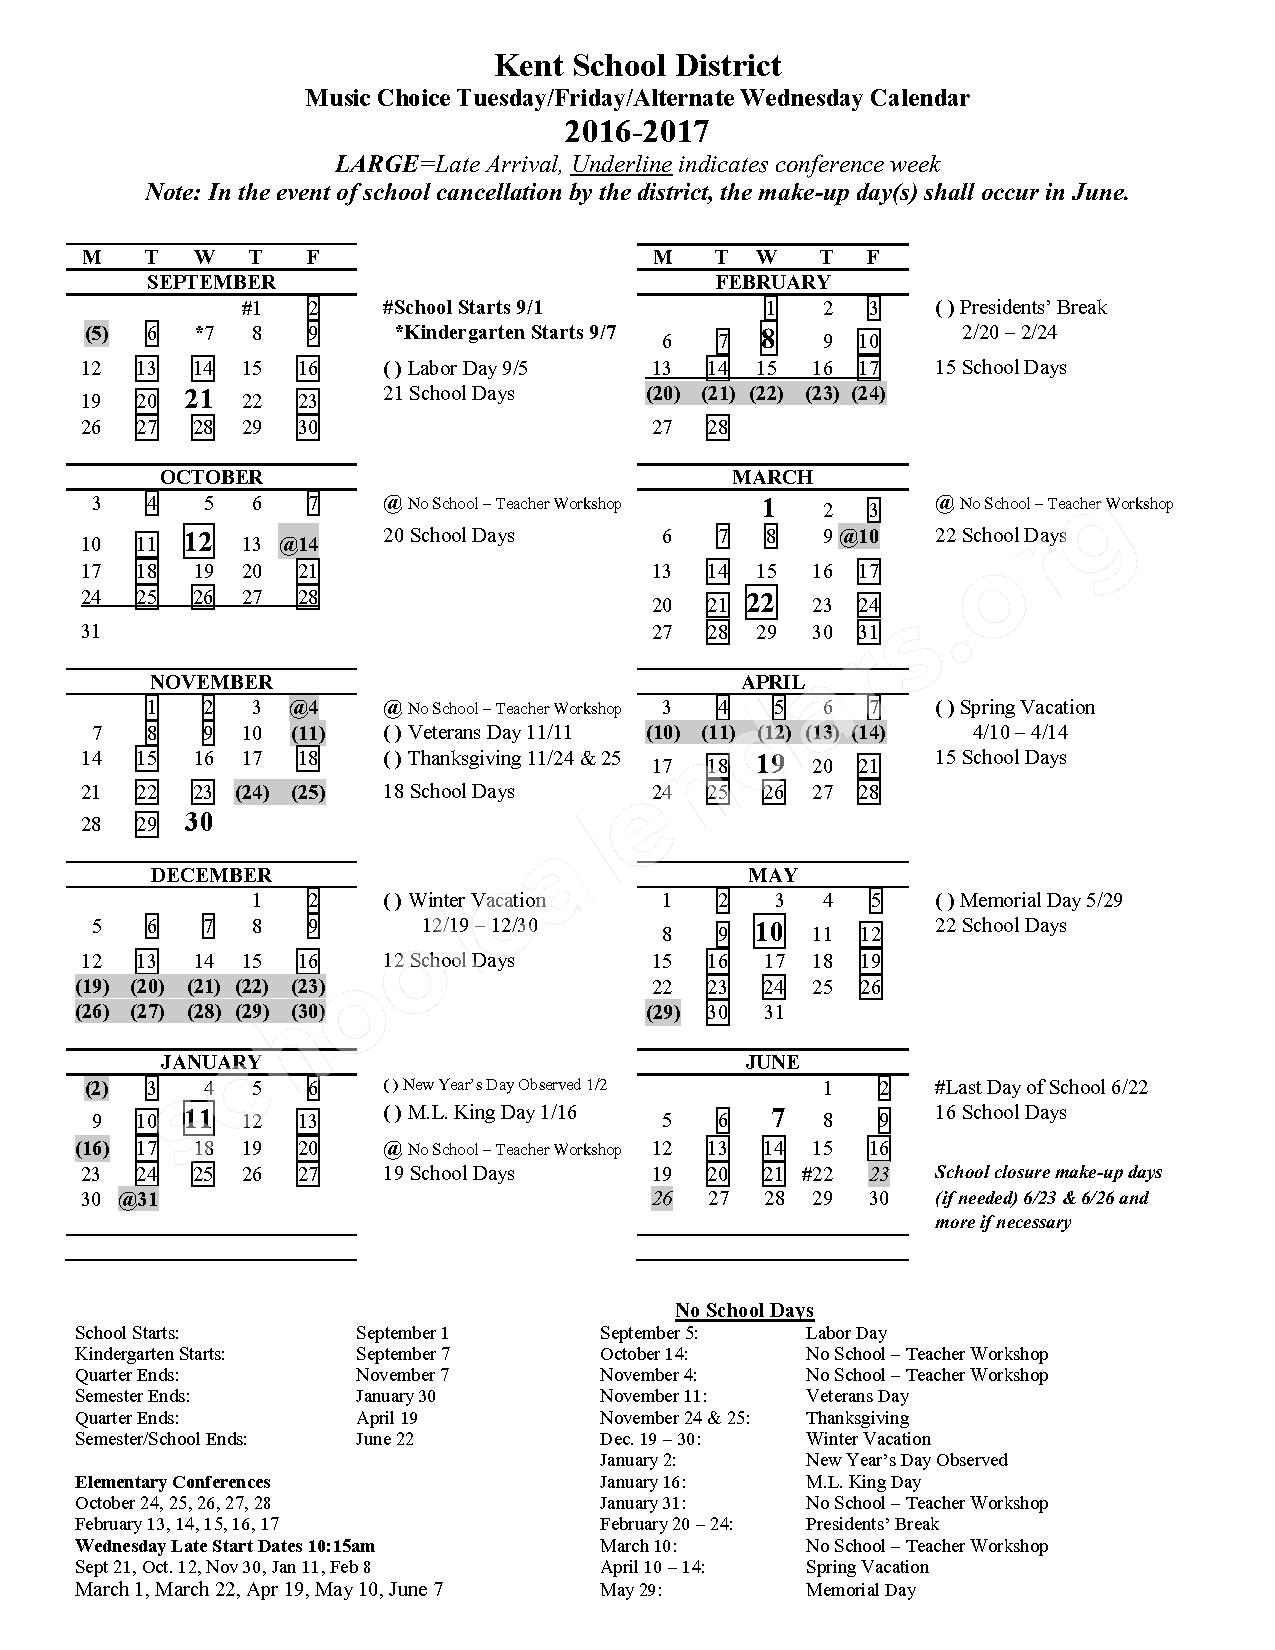 2016 - 2017 Music Choice Calendar – Meadow Ridge Elementary School – page 1